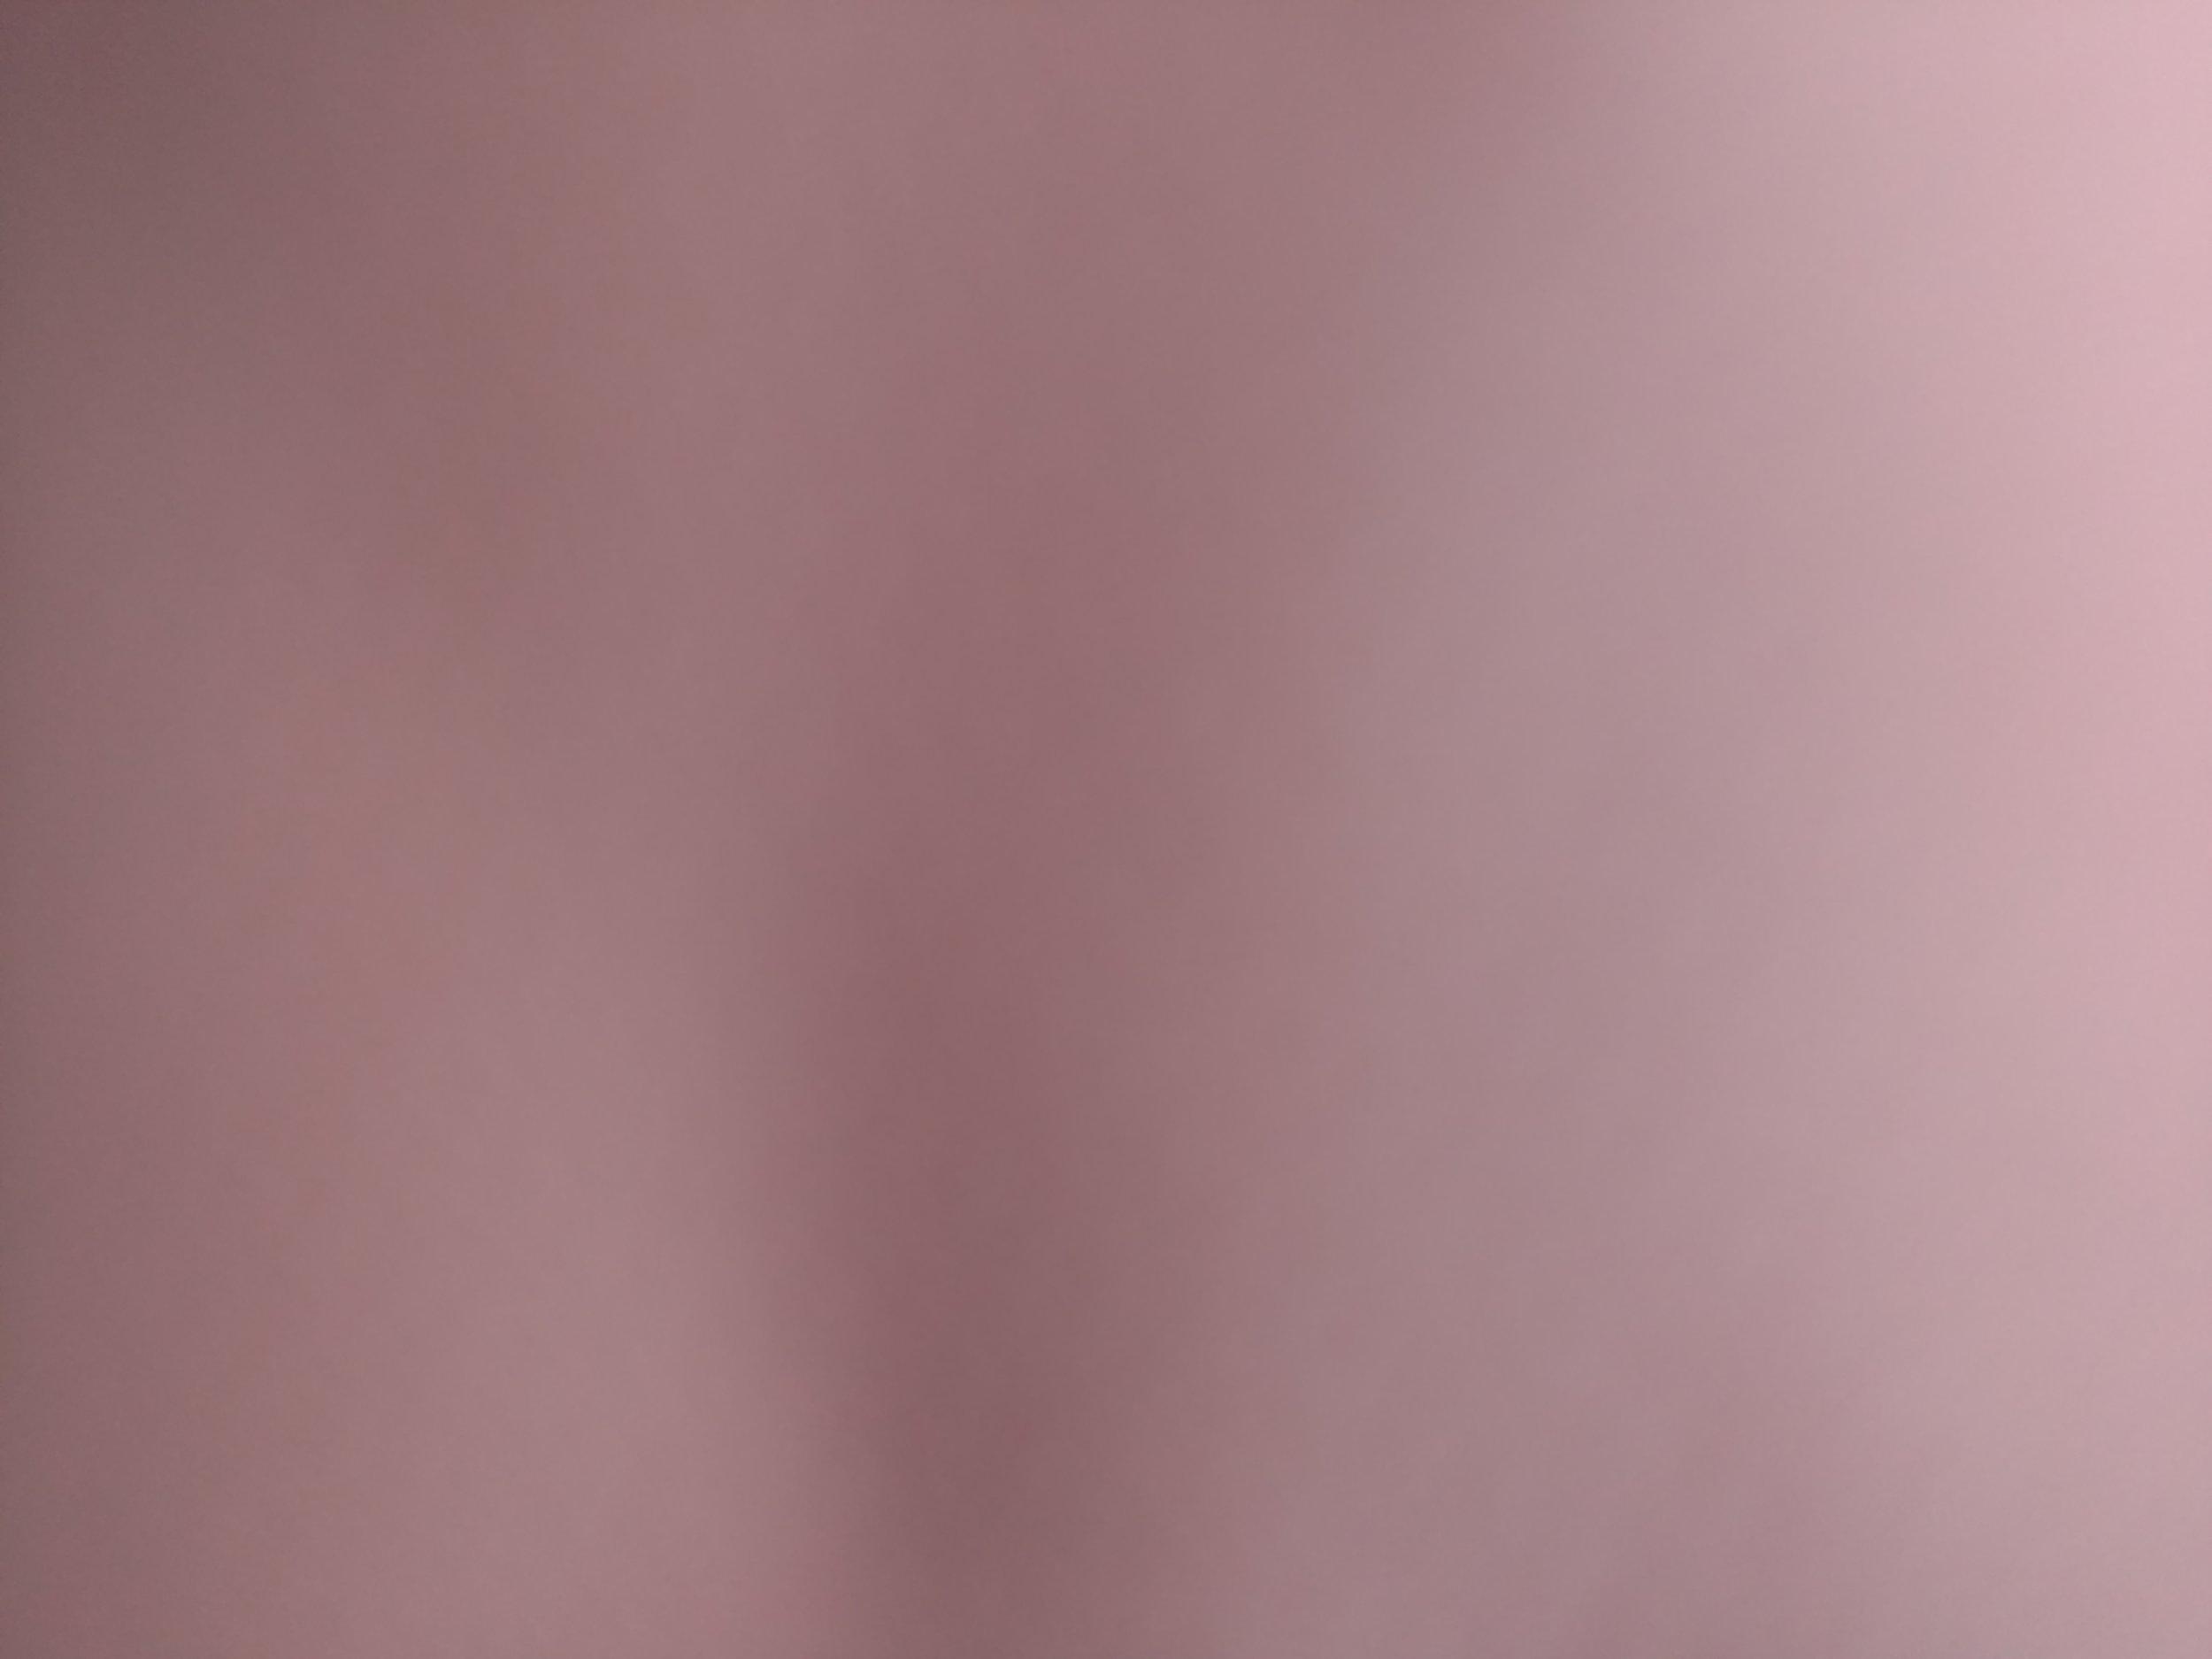 willroth-co-free-texture-gradient-023.jpg